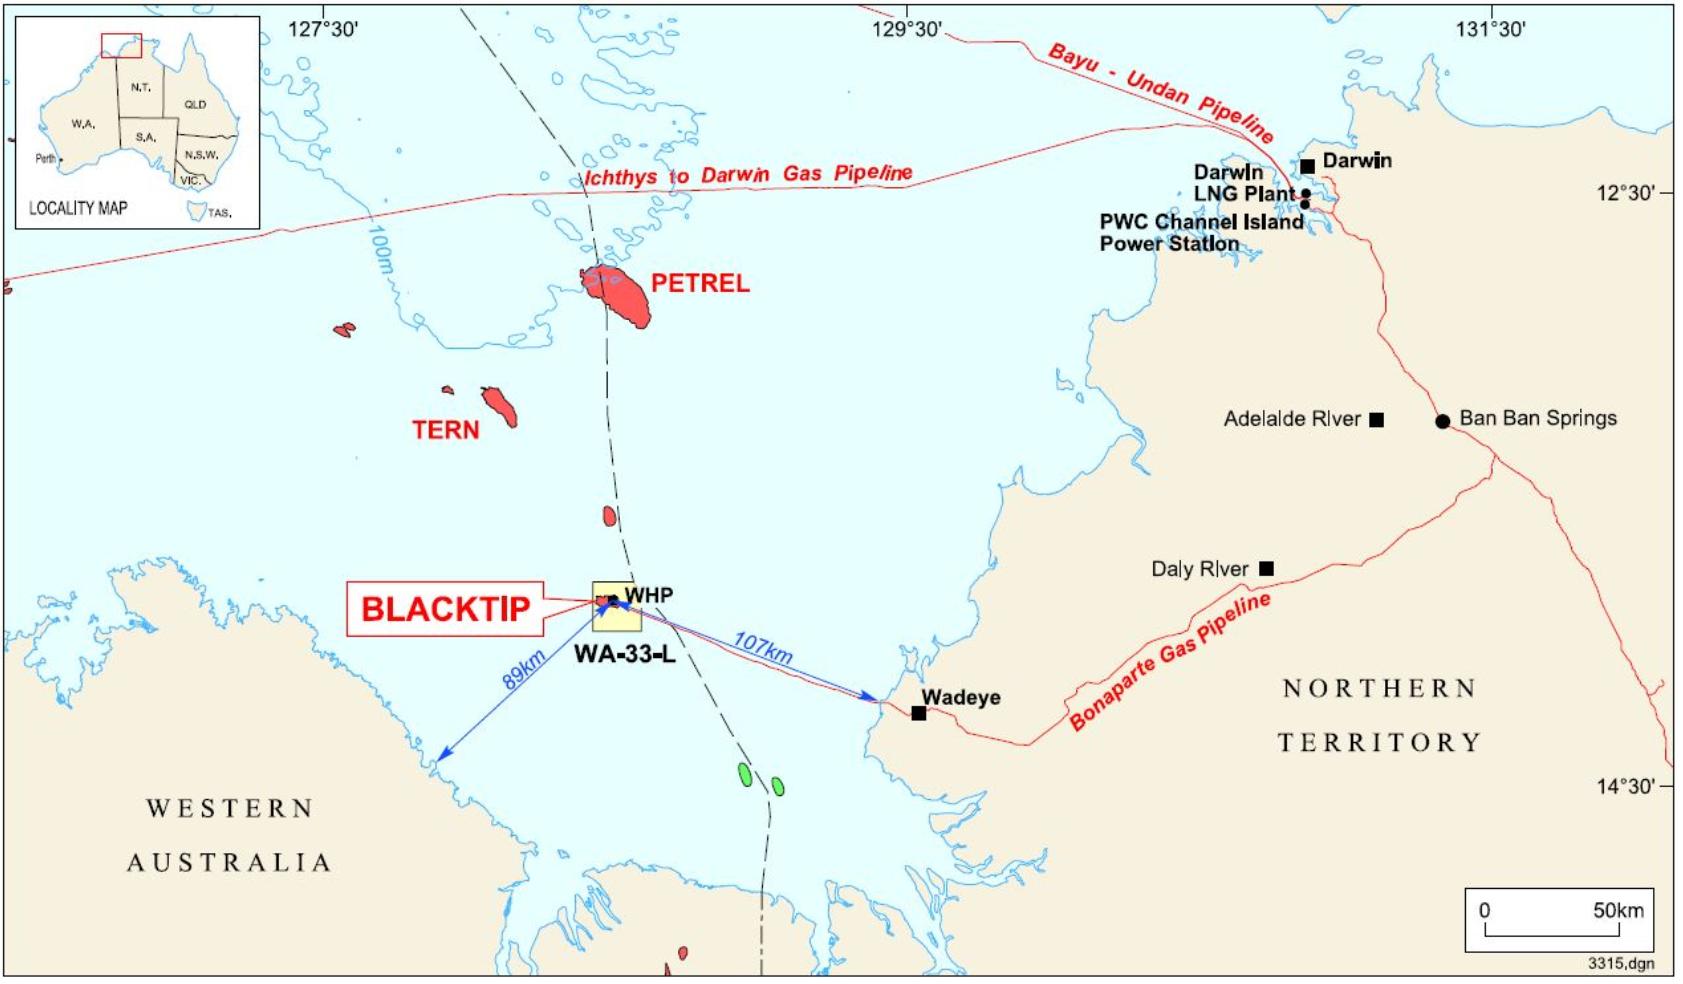 Project map - Blacktip Gas (refer to Description)